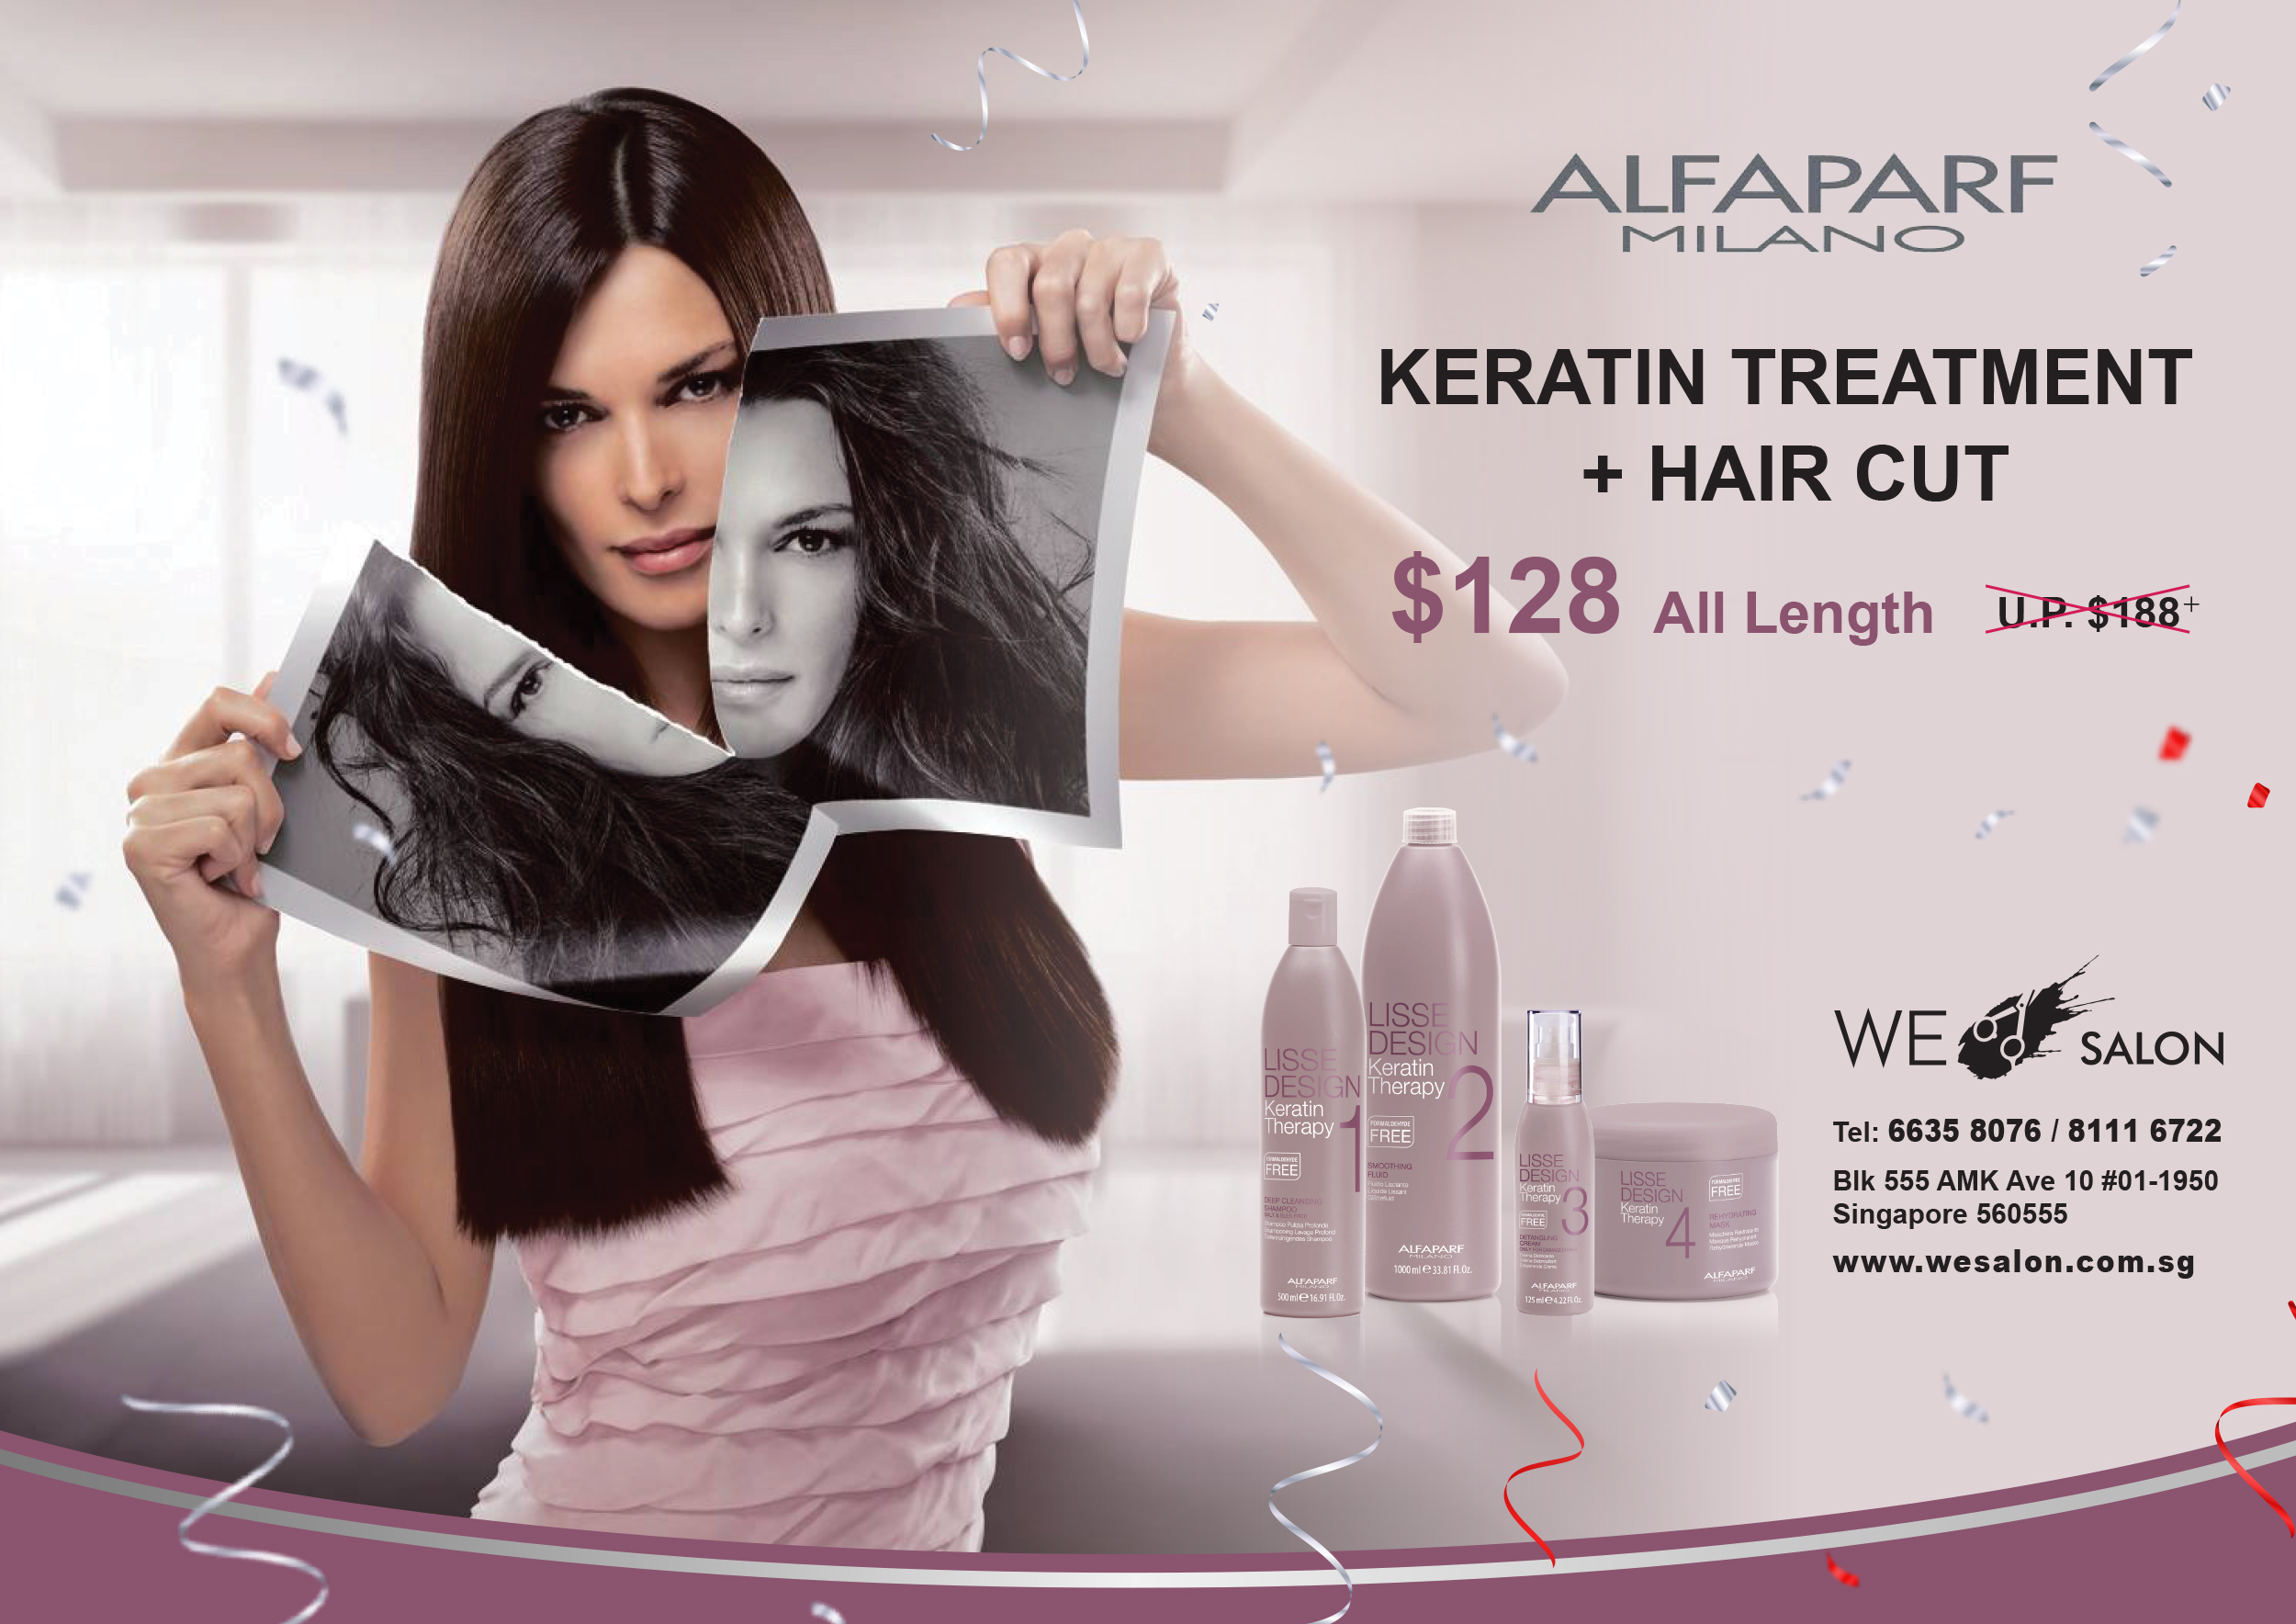 Alfaparf Keratin Treatment + Hair Cut = $128 (All Hair Length)